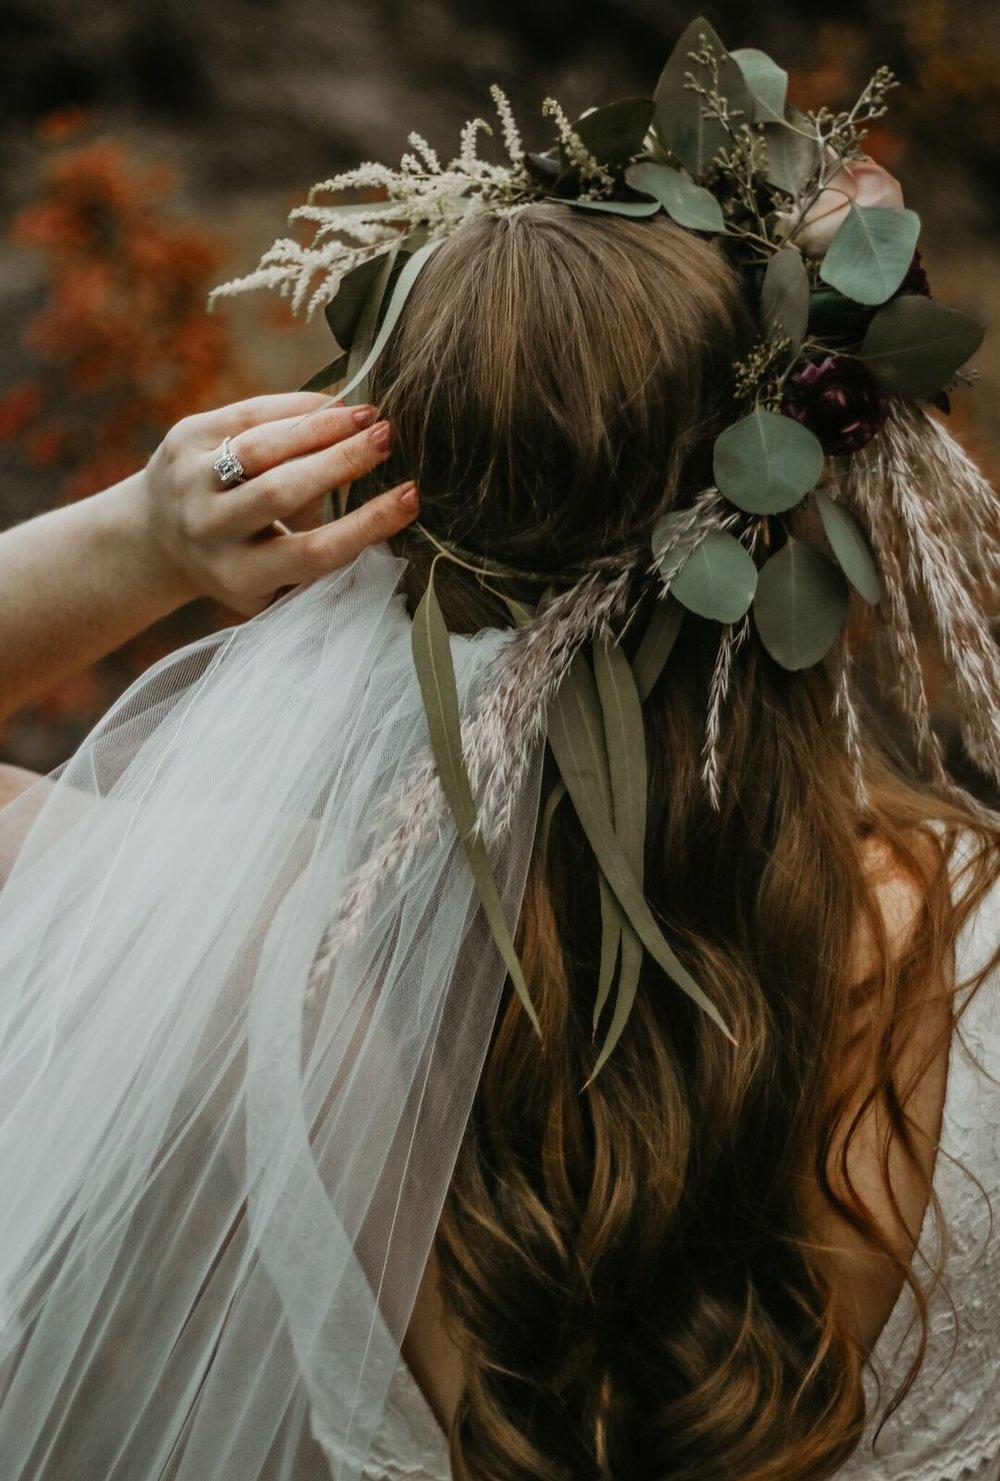 spokane river wedding photo shoot image9